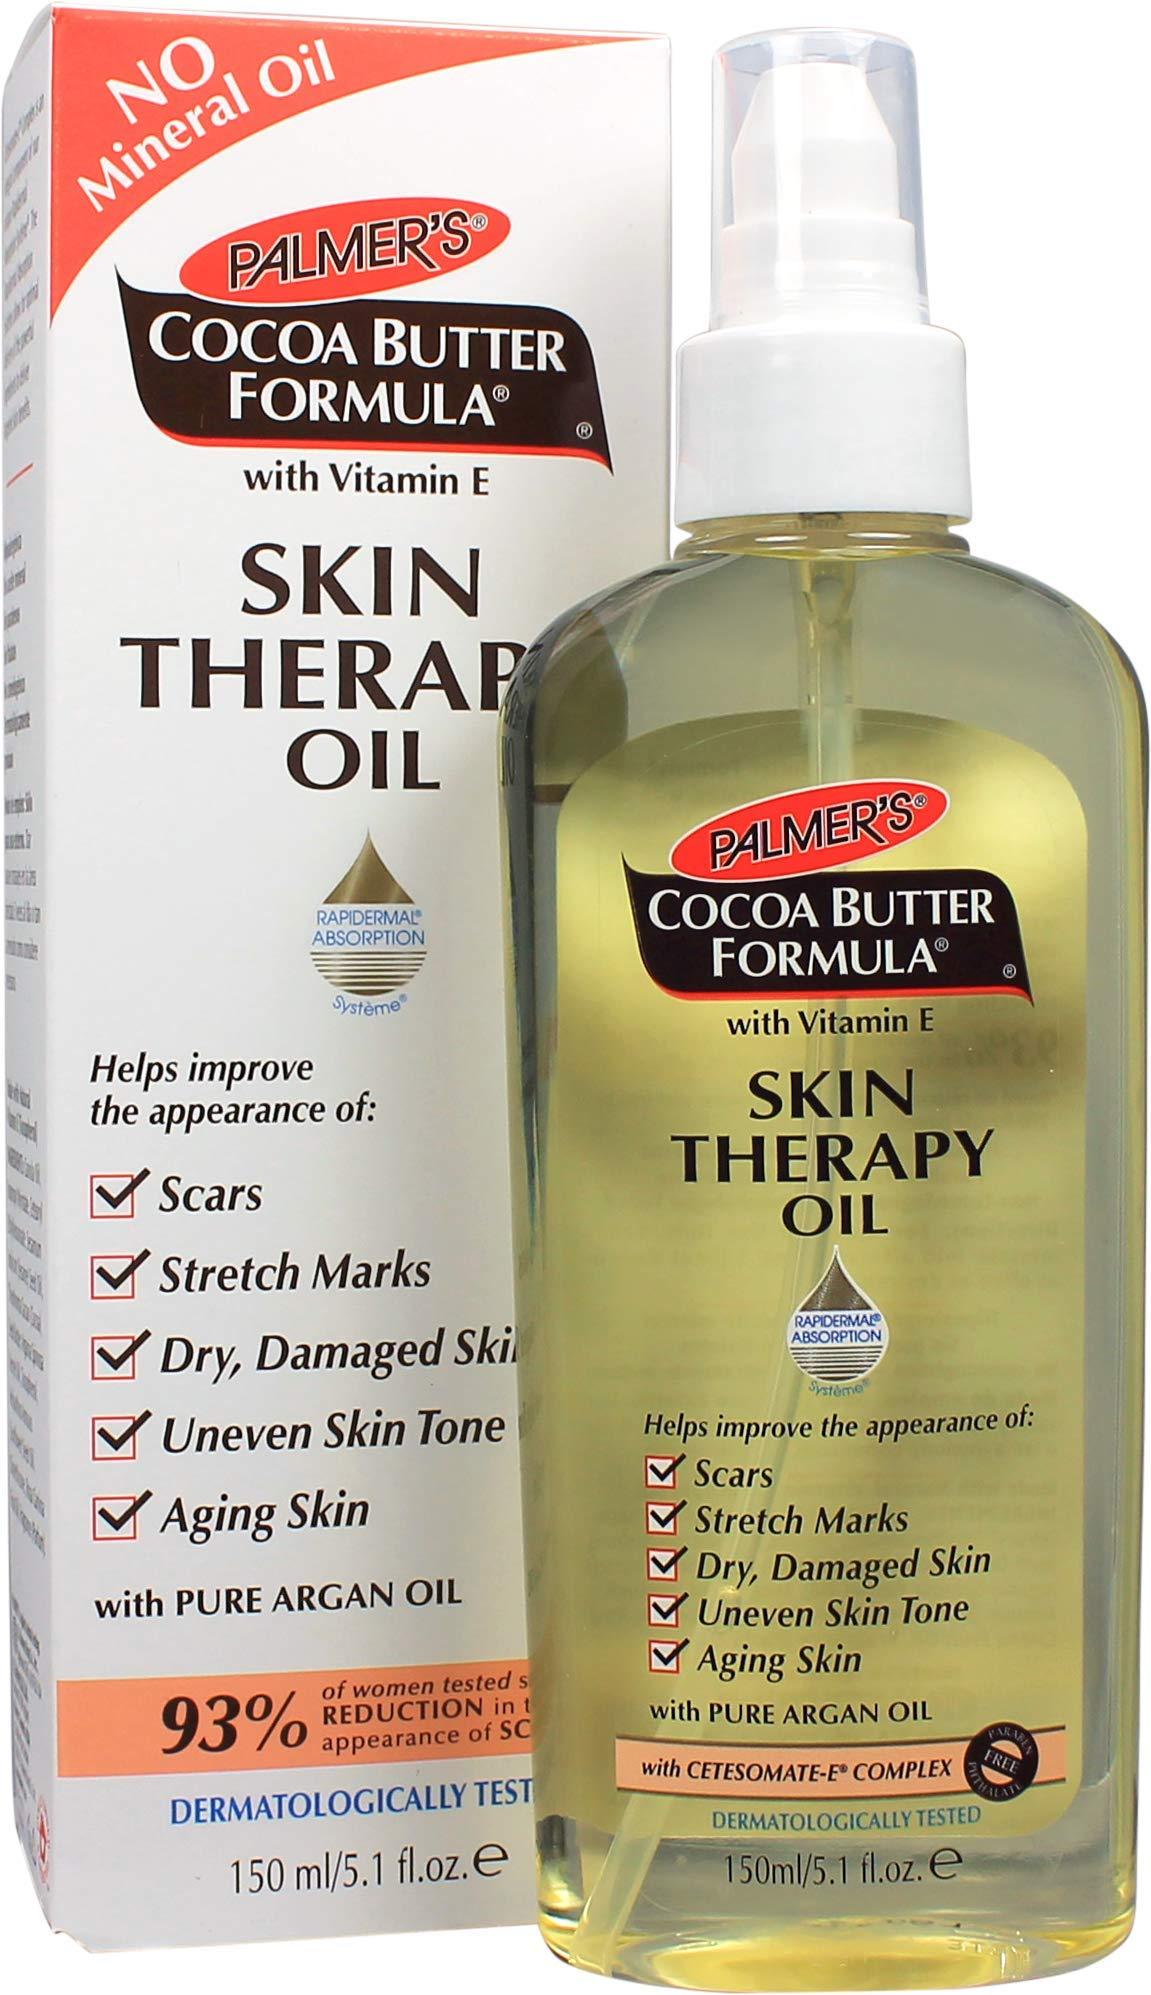 Palmer's Cocoa Butter Formula Skin Therapy Oil (Cocoa Butter Fragrance) 150ml